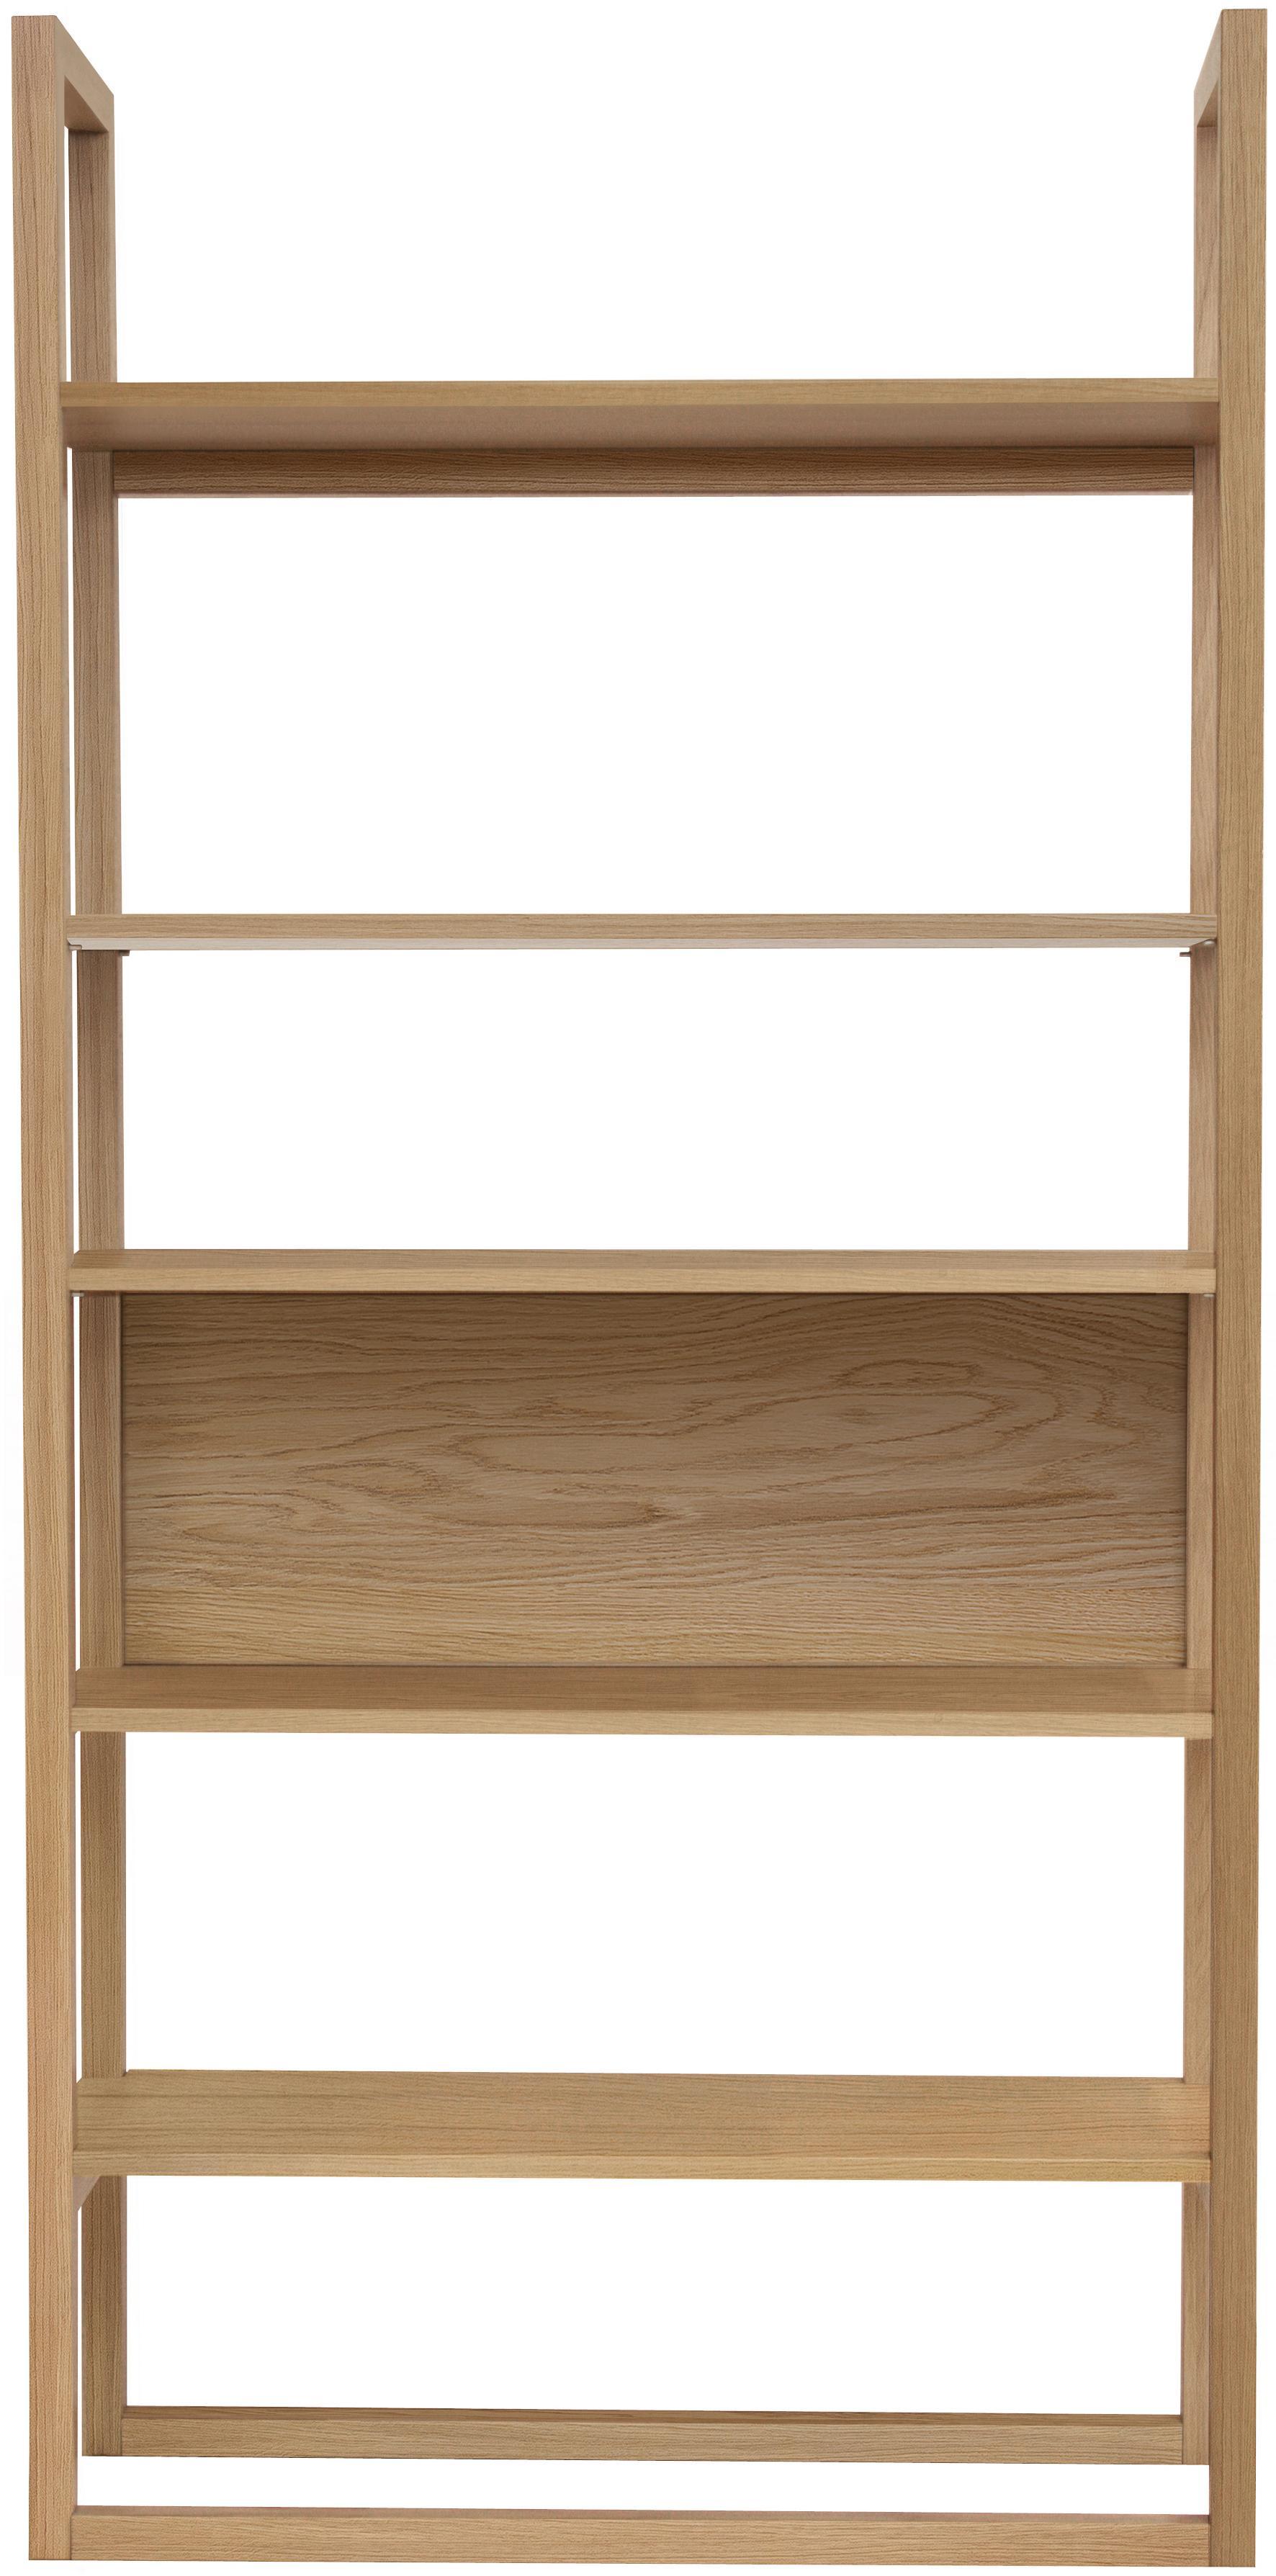 Regal NewEst aus Eichenholz, Korpus: Eichenholz, klar lackiert, Eiche, 90 x 185 cm